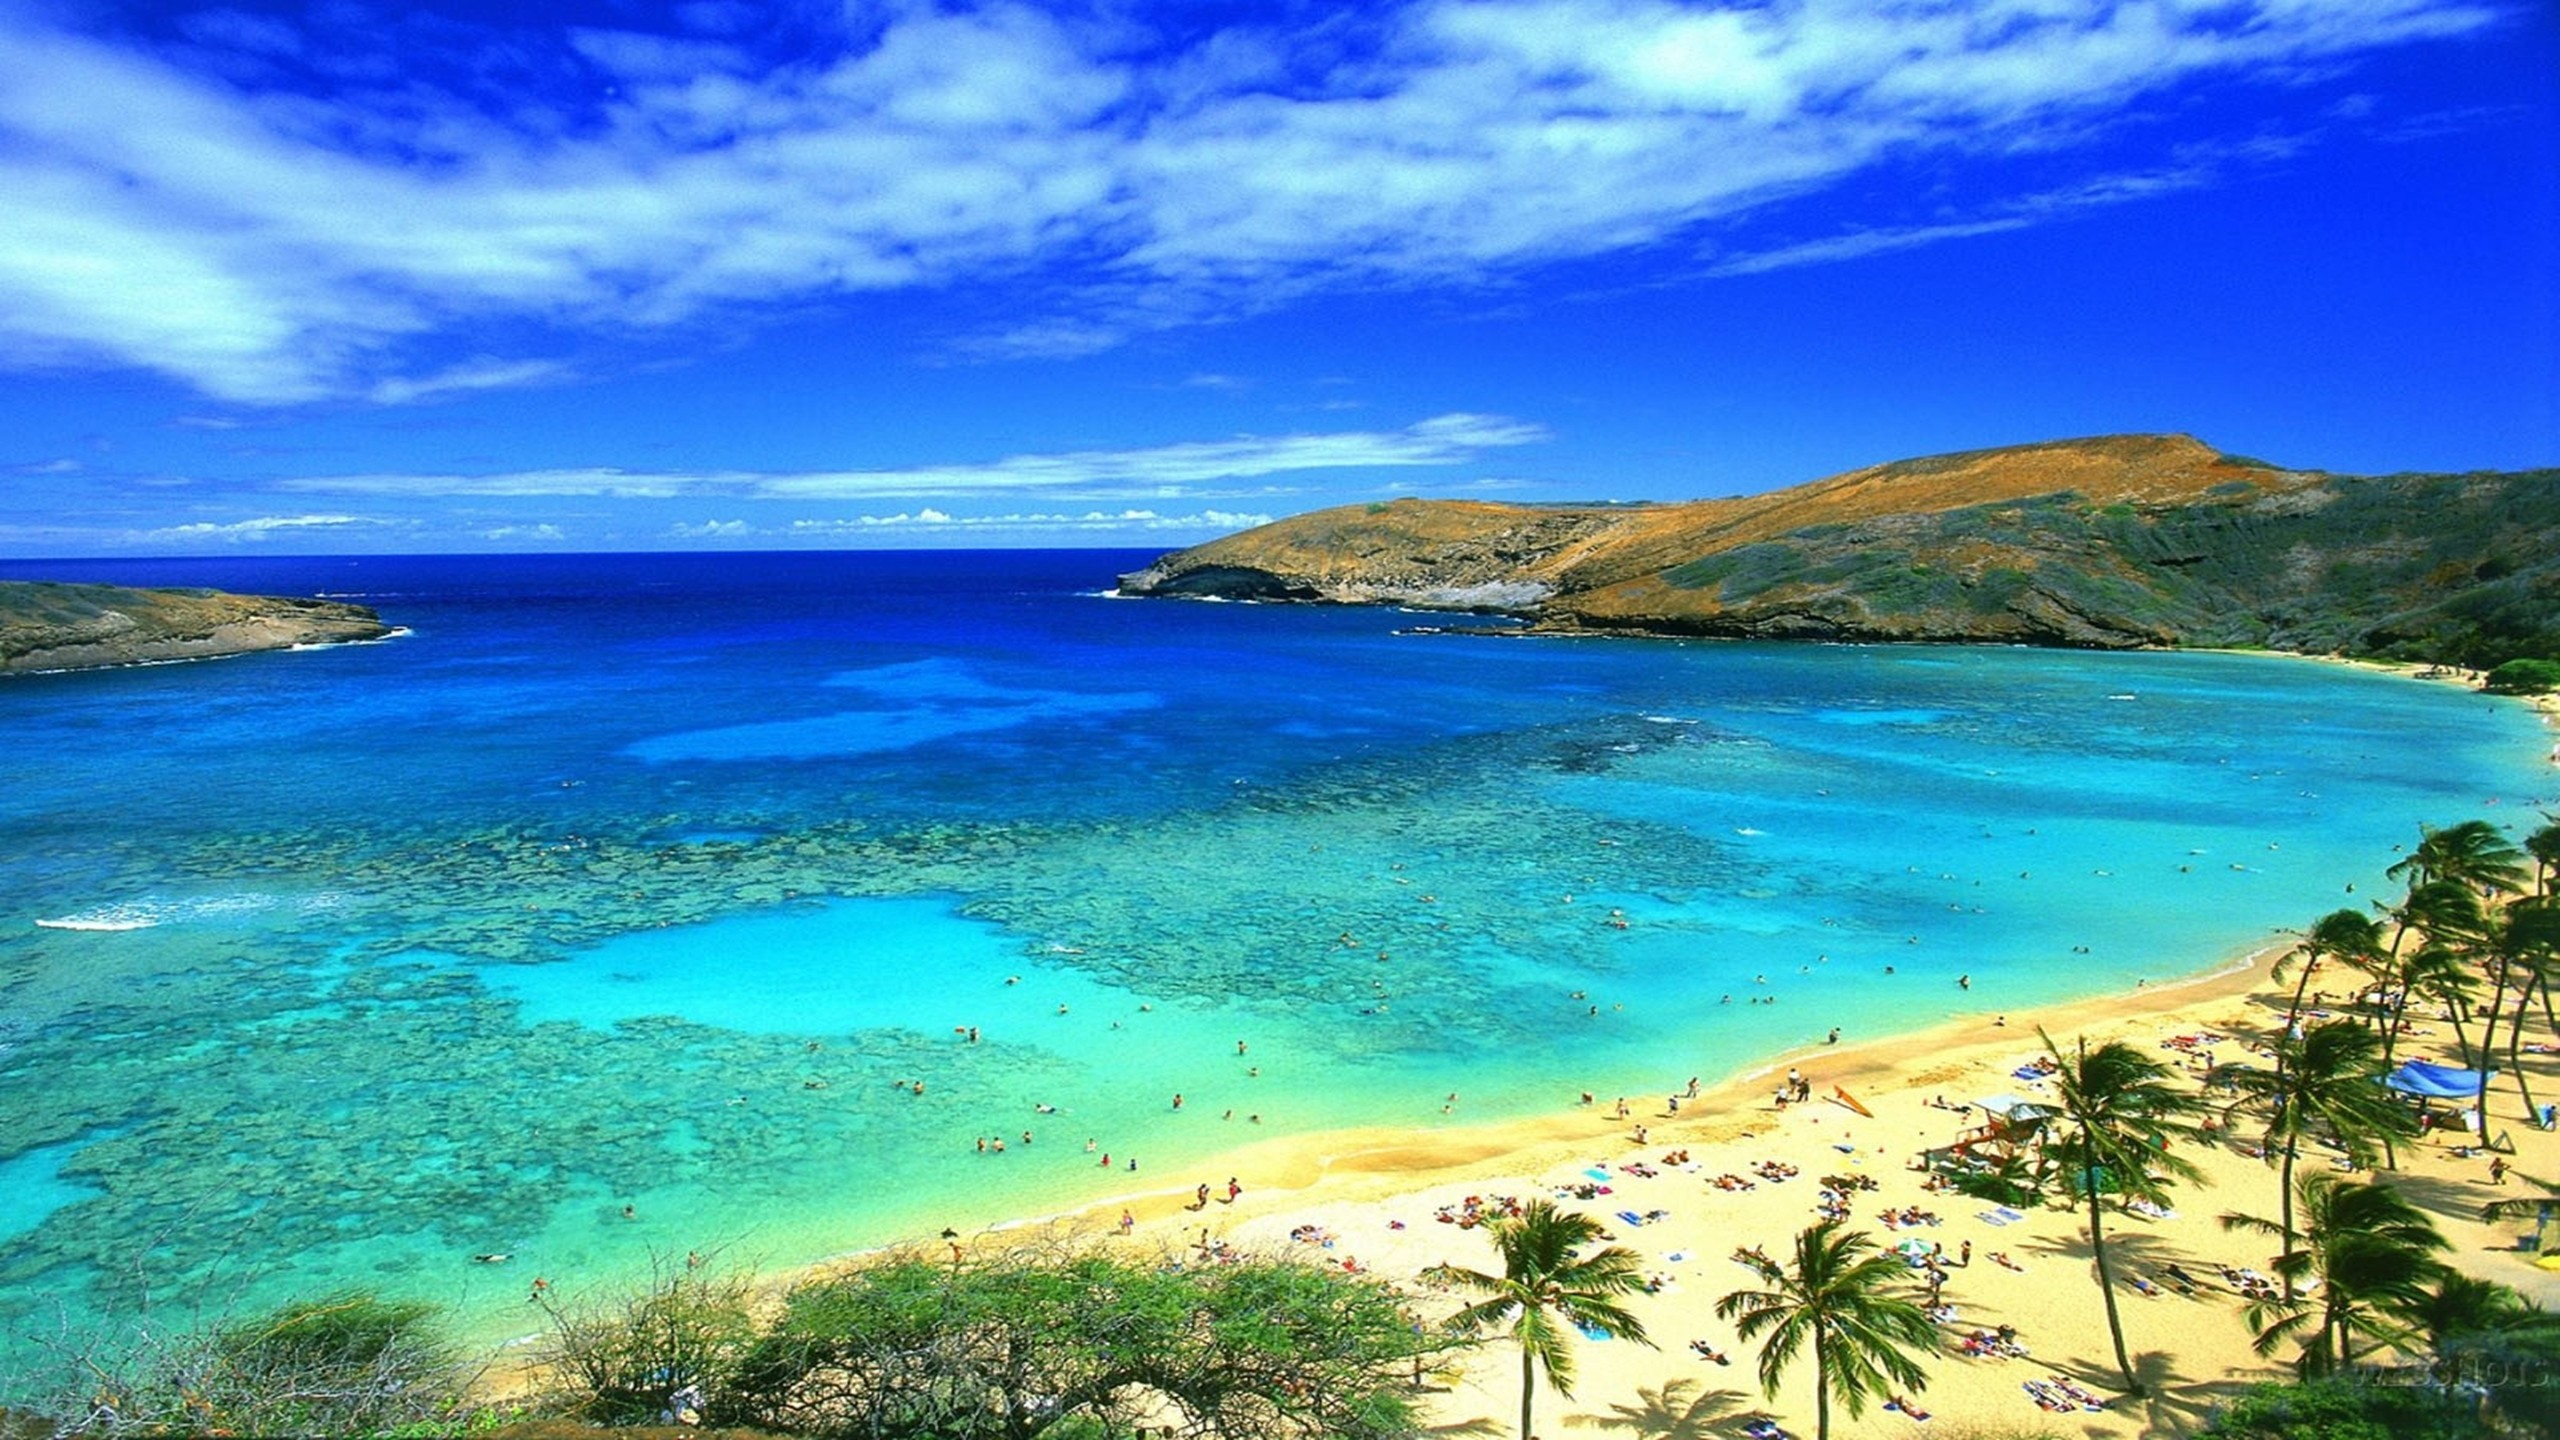 Res: 2560x1440, Beautiful Waikiki Beach Images